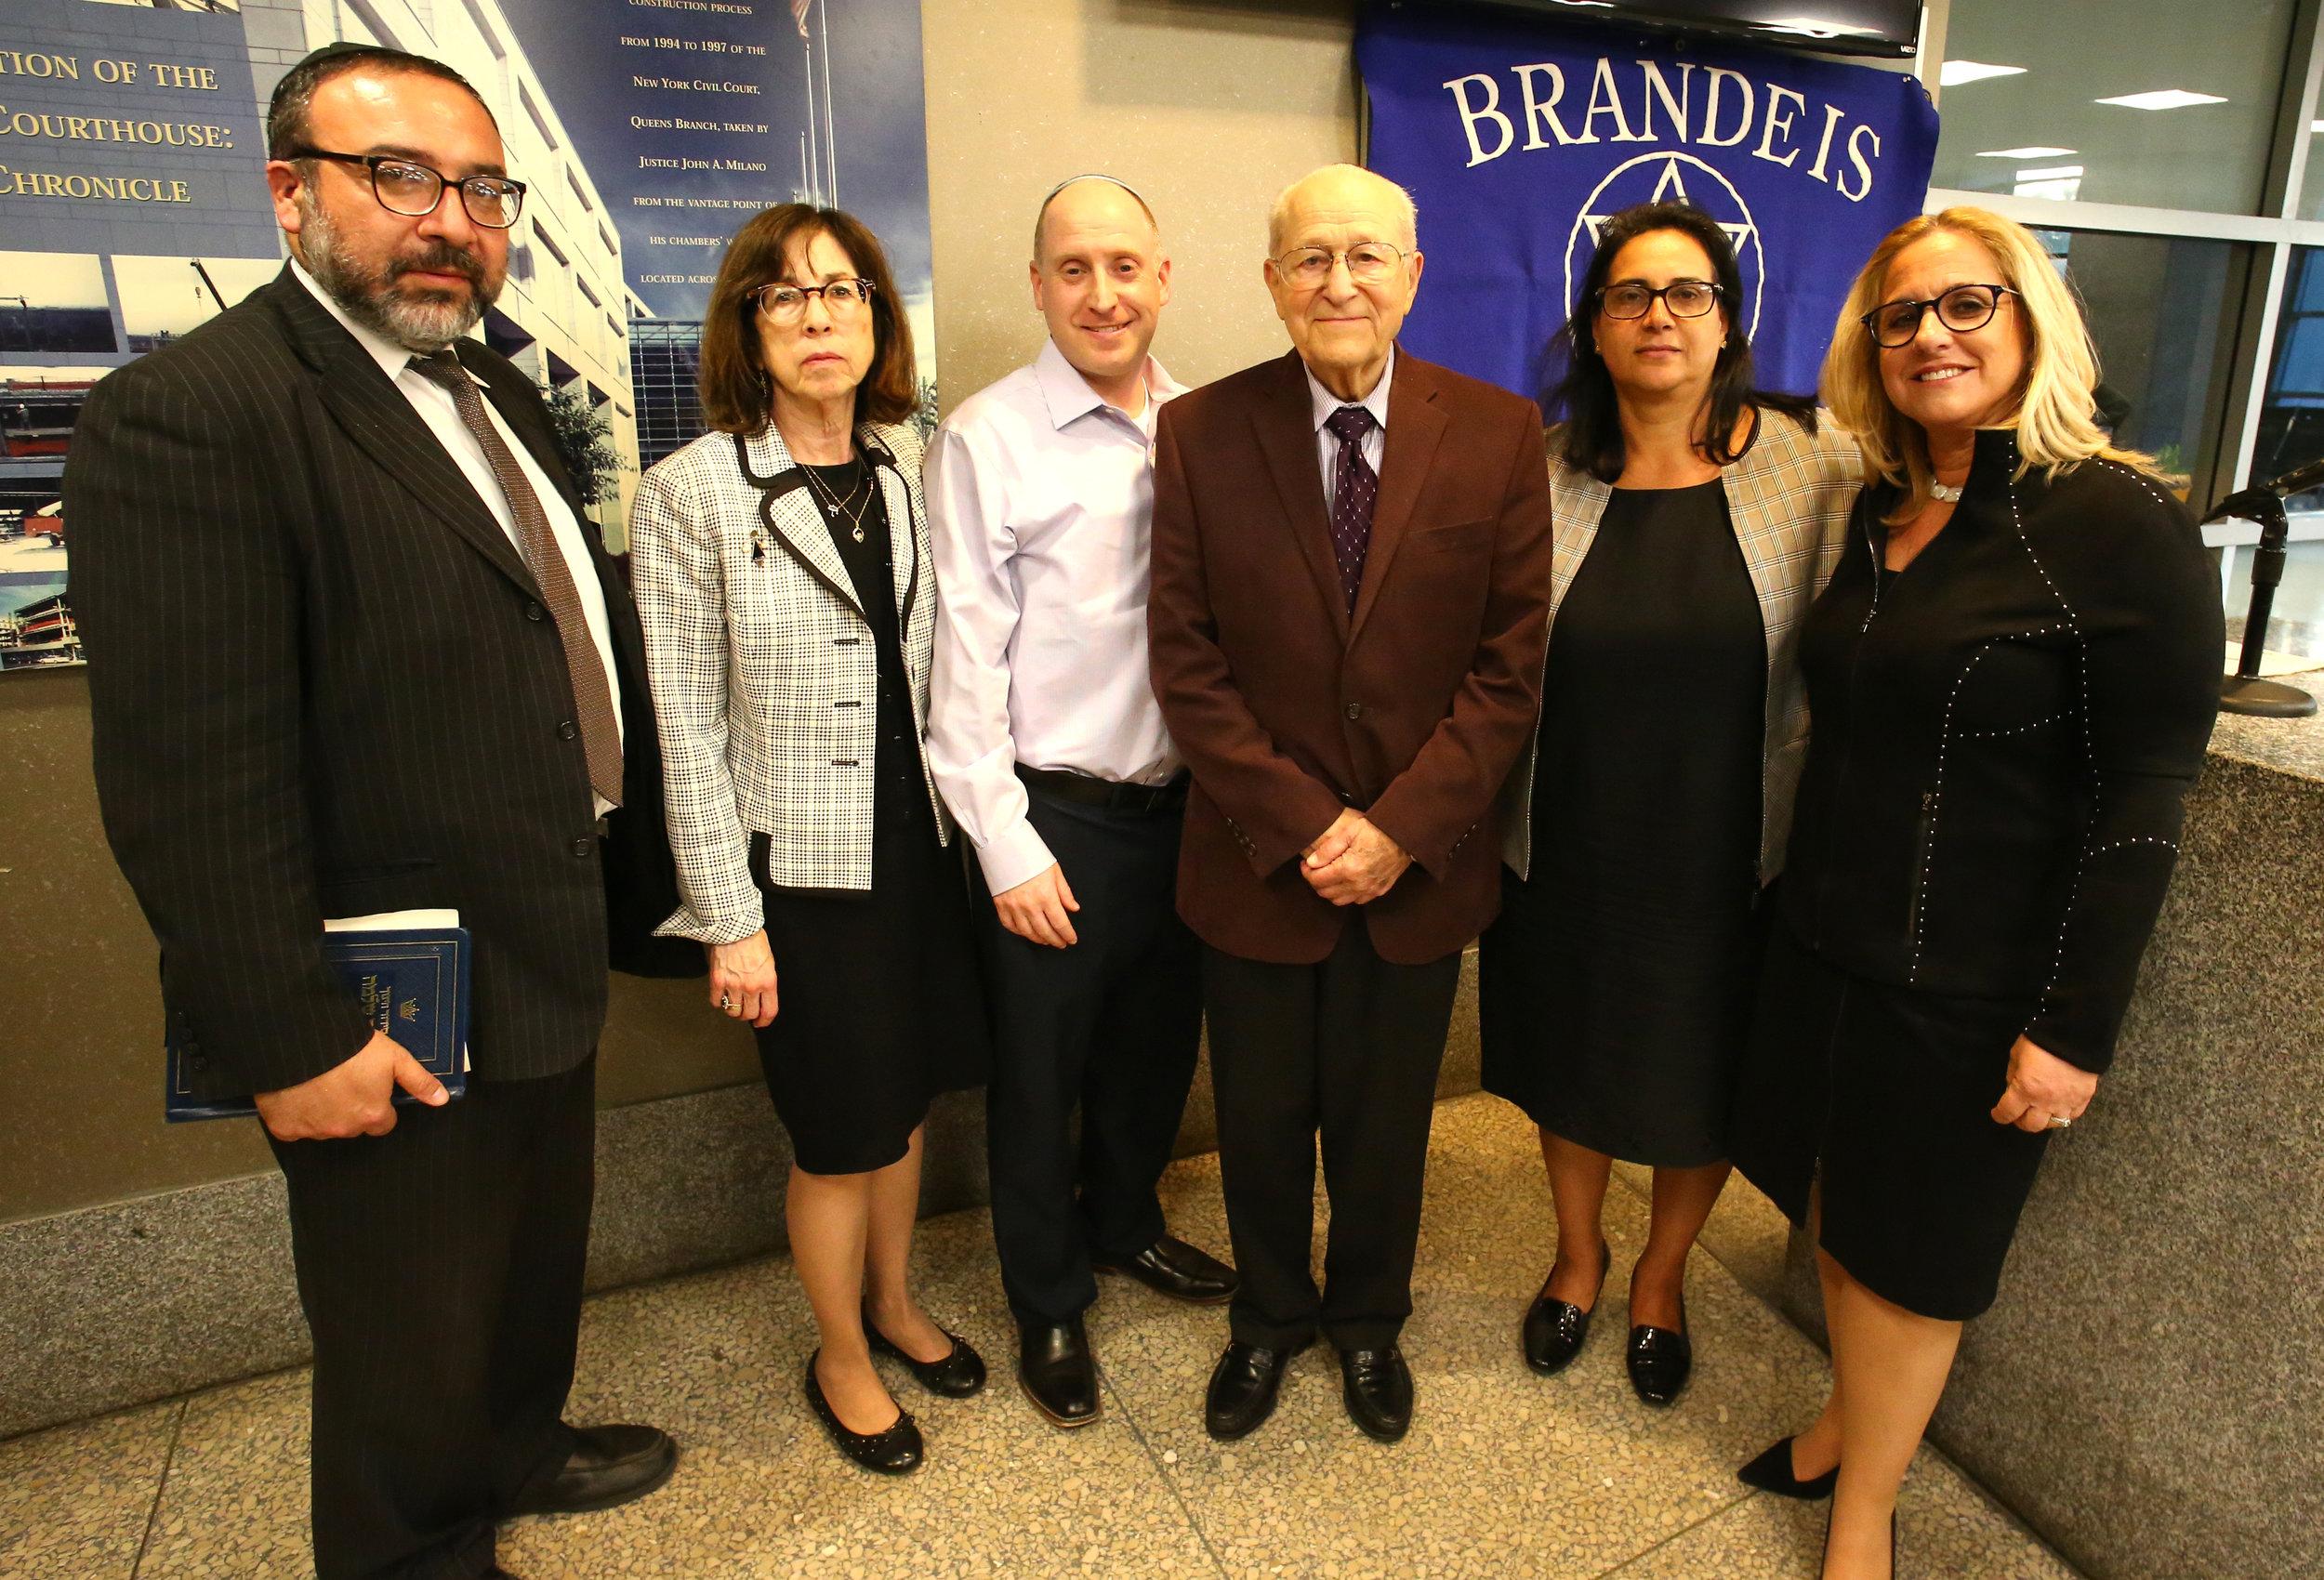 Brandeis-Association-Holocaust-Remembrance-Katz-0017.JPG